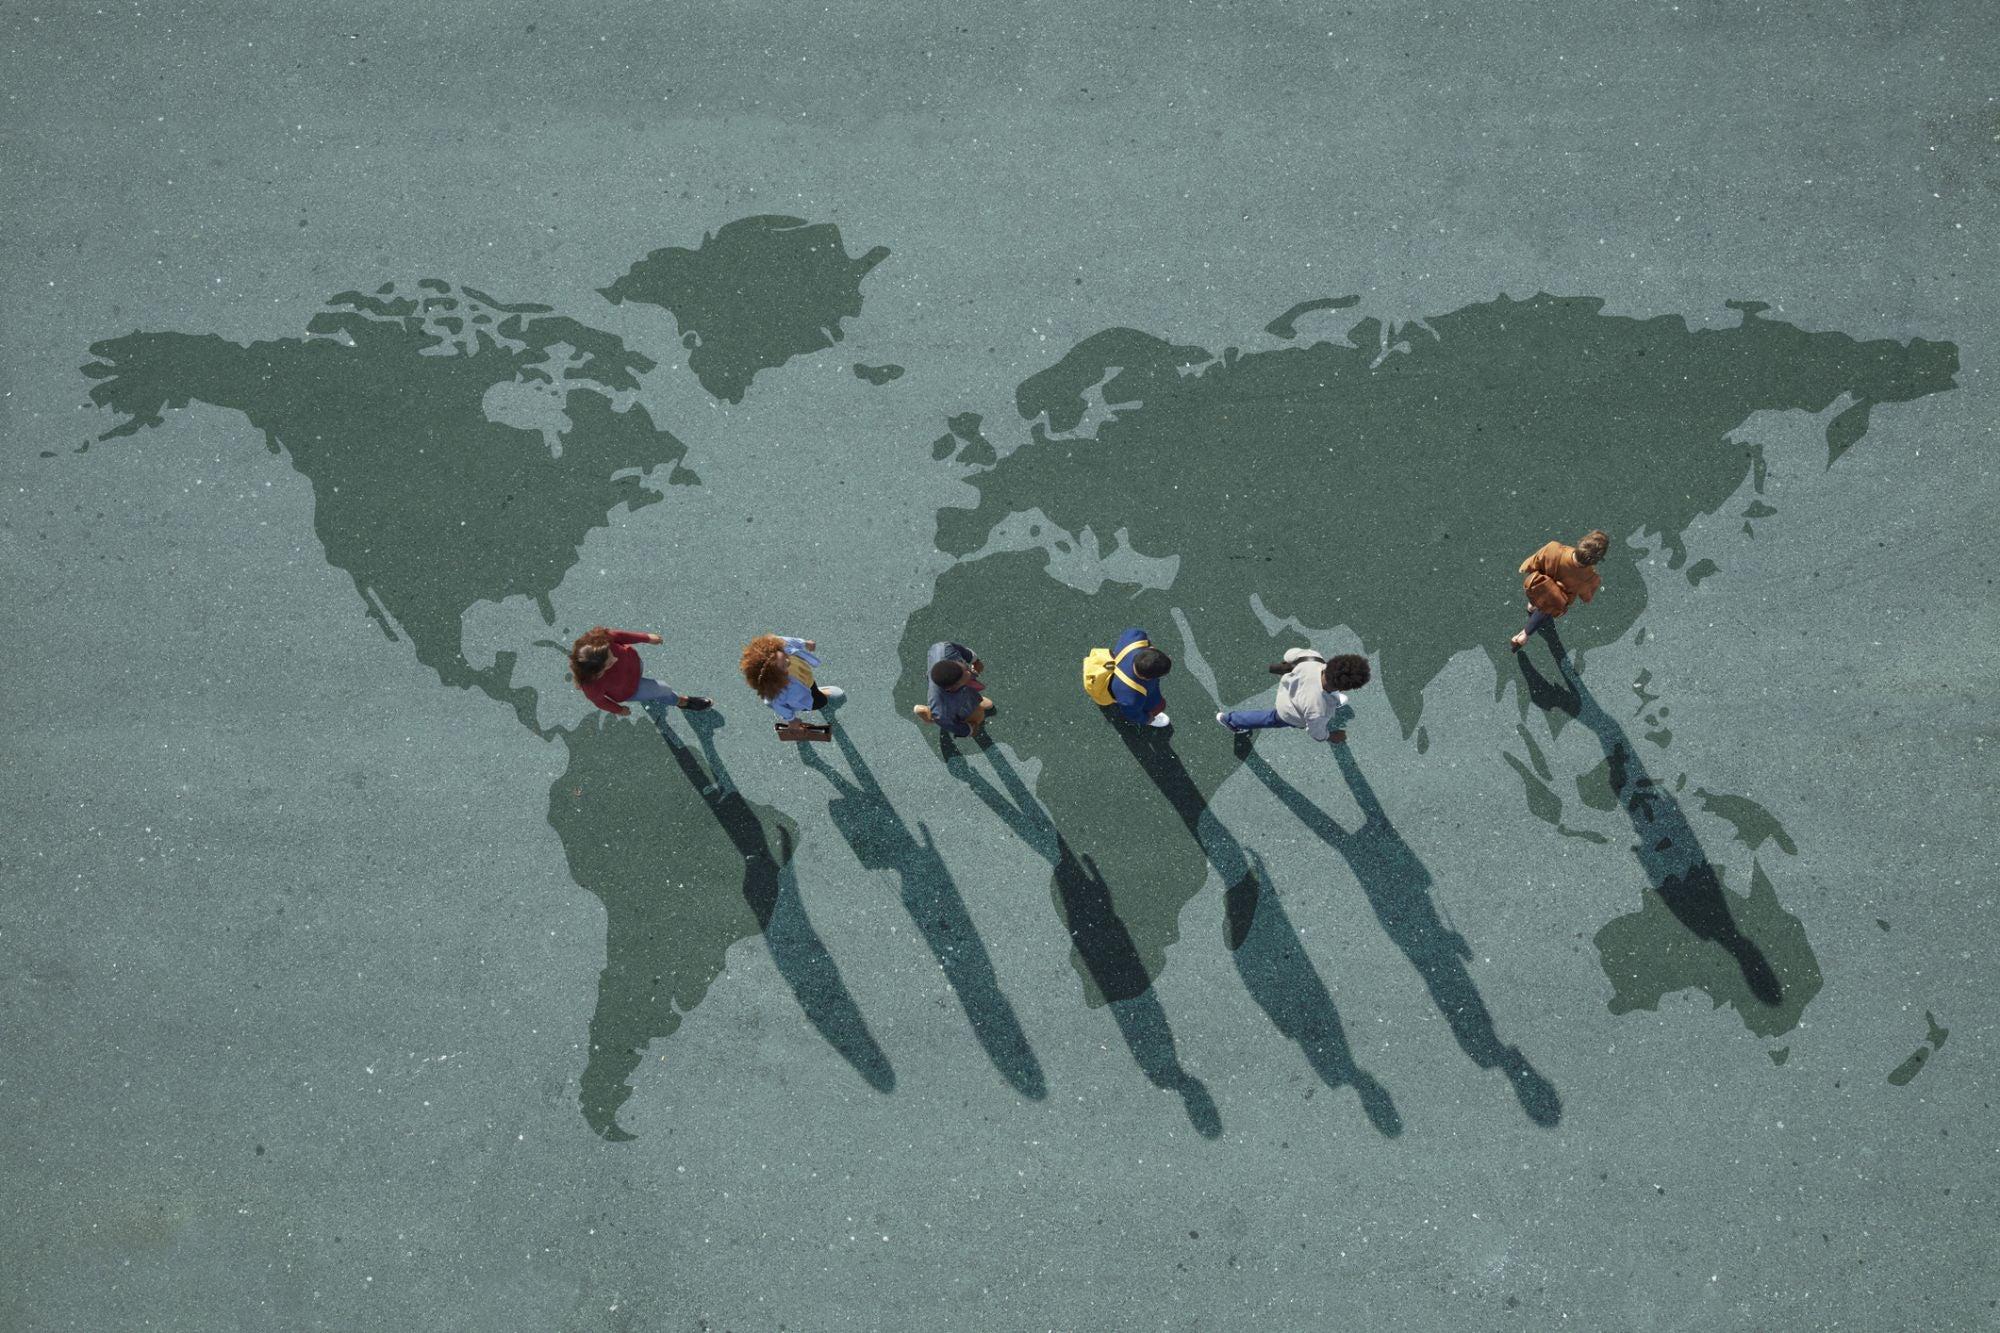 entrepreneur.com - Jeffrey Hayzlett - 4 Principles of Servant Leadership